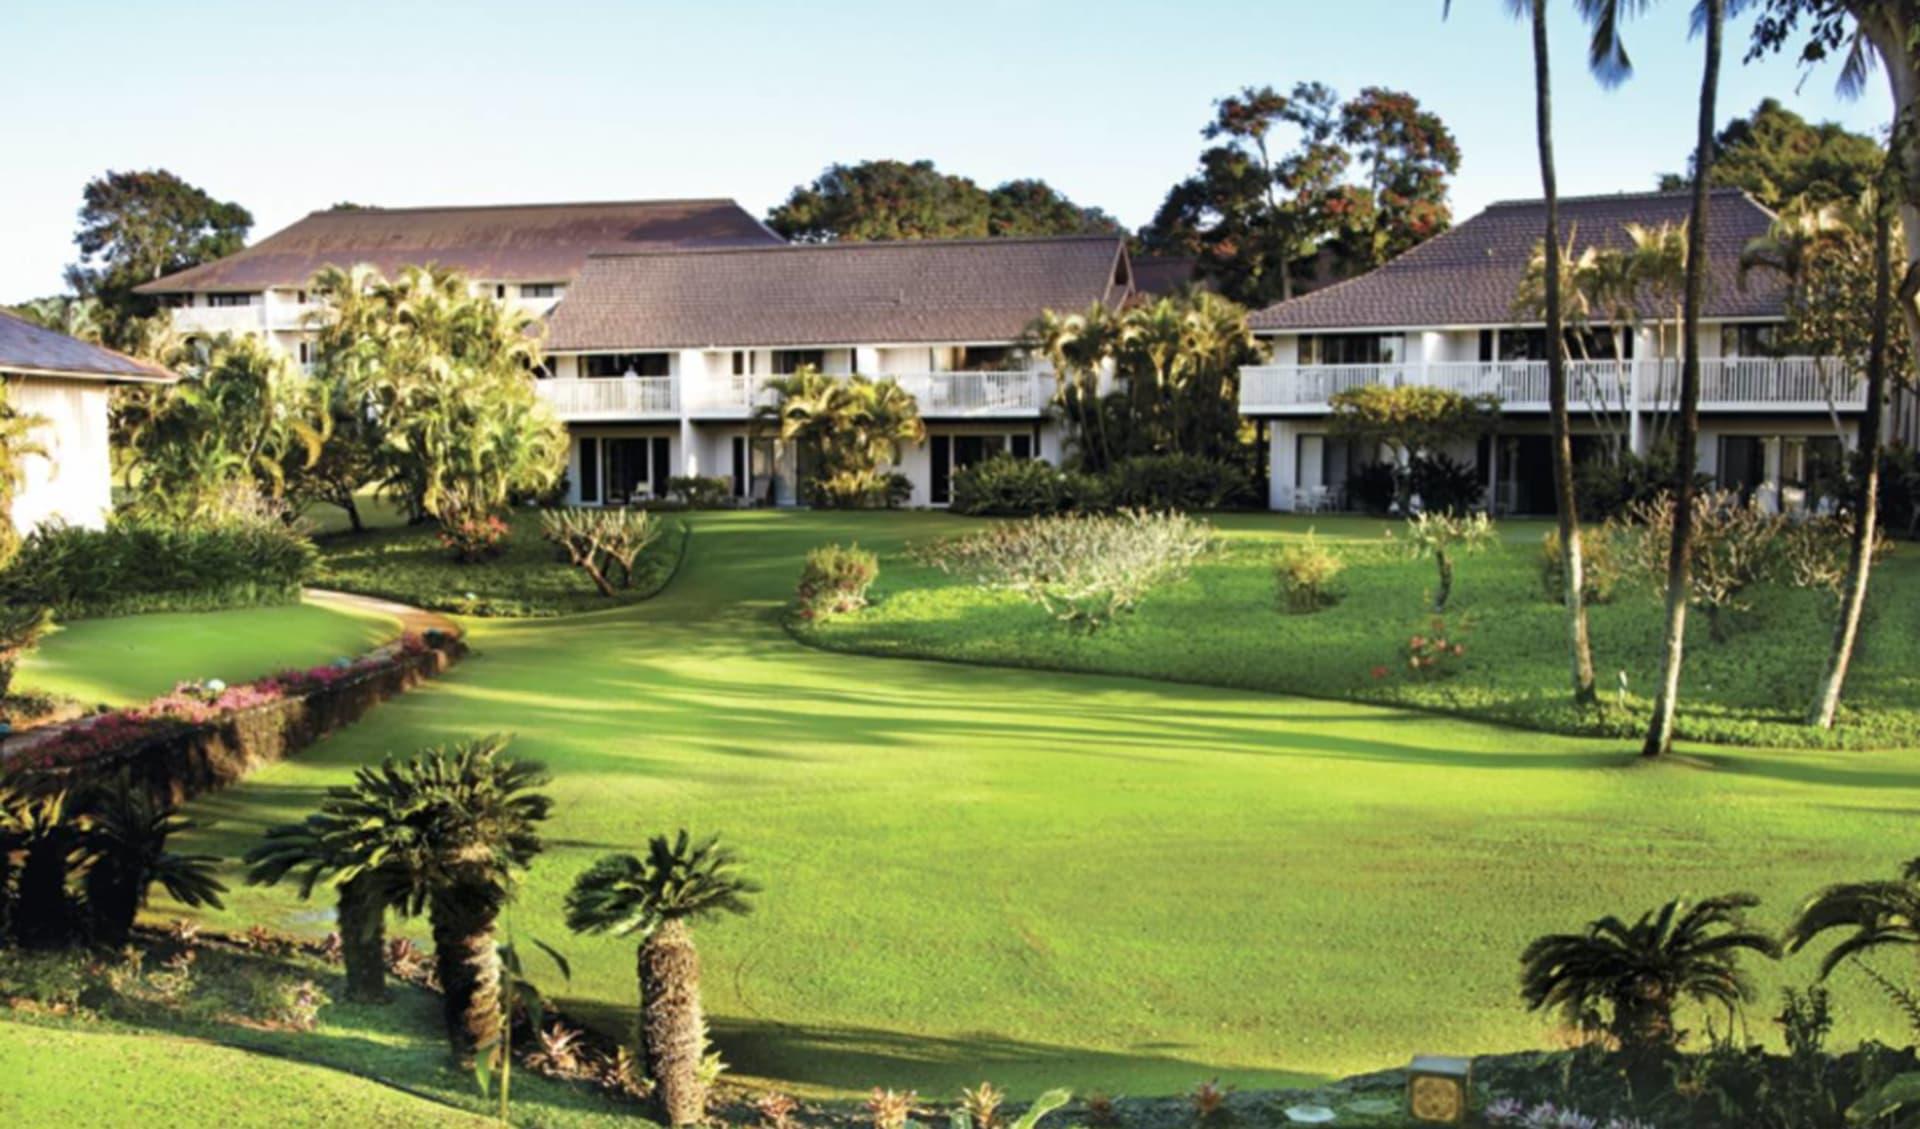 Castle Kiahuna Plantation in Poipu - Kauai: natur castle kiahuna plantation gartenanlage hotel